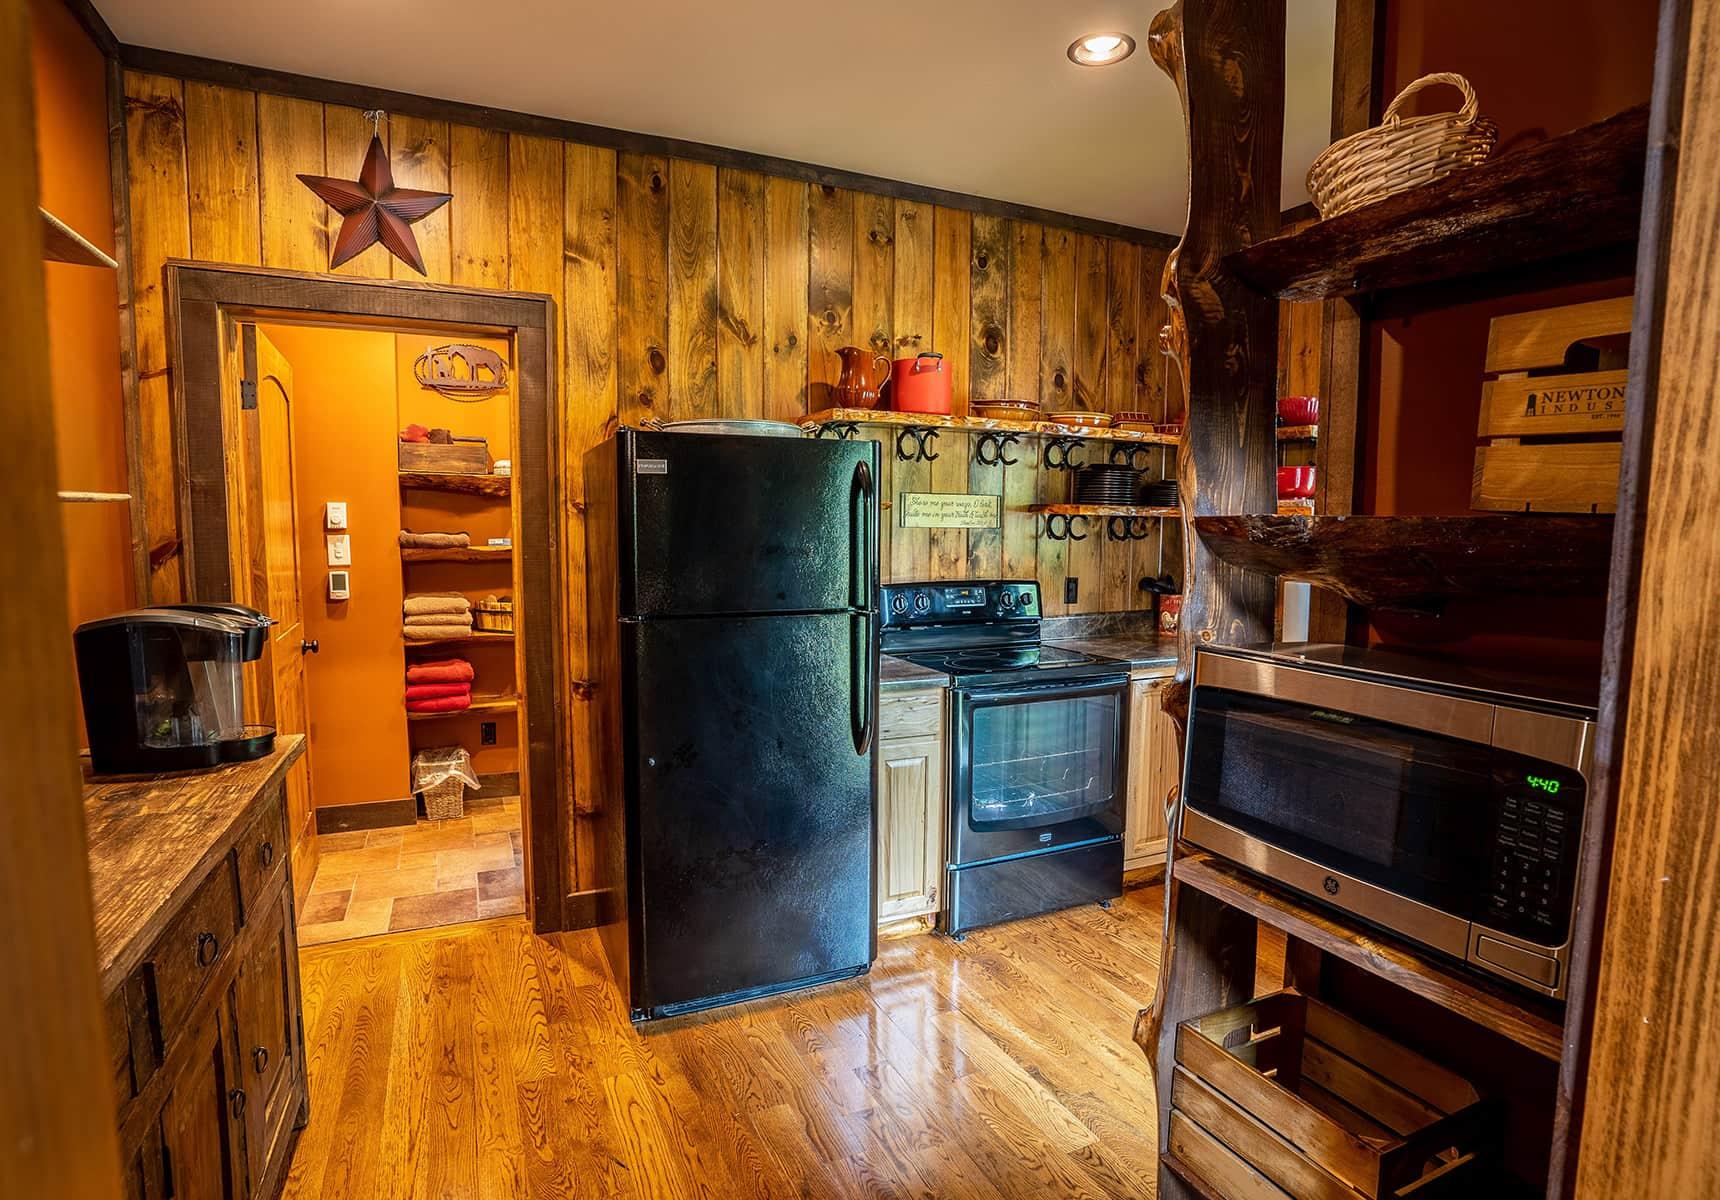 Kitchen of a Luxury Cabin Rental in WV